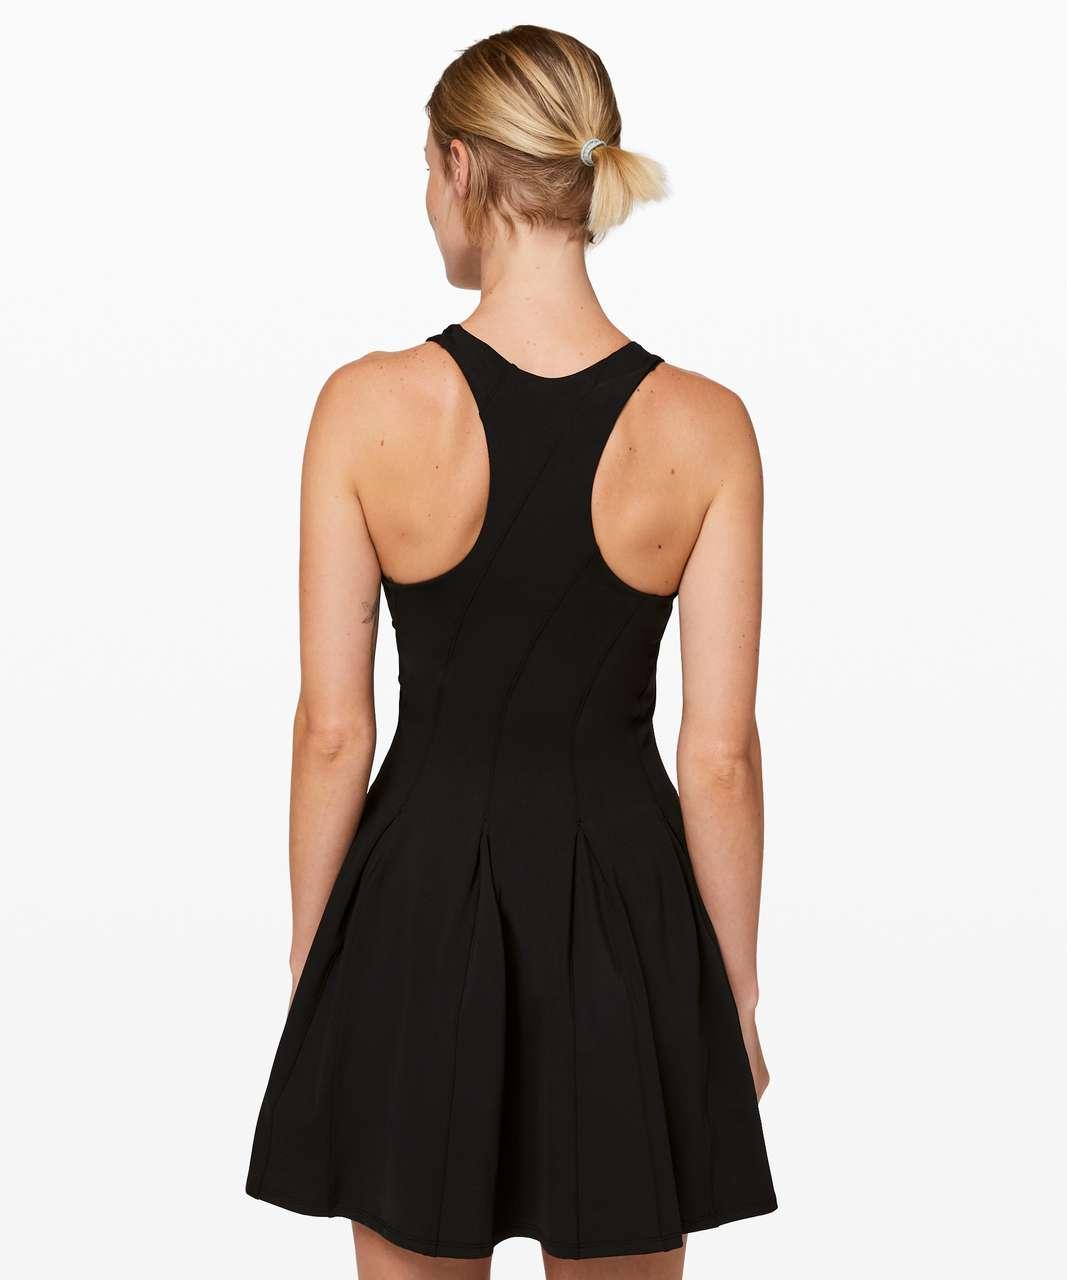 Lululemon Court Crush Tennis Dress Black Lulu Fanatics